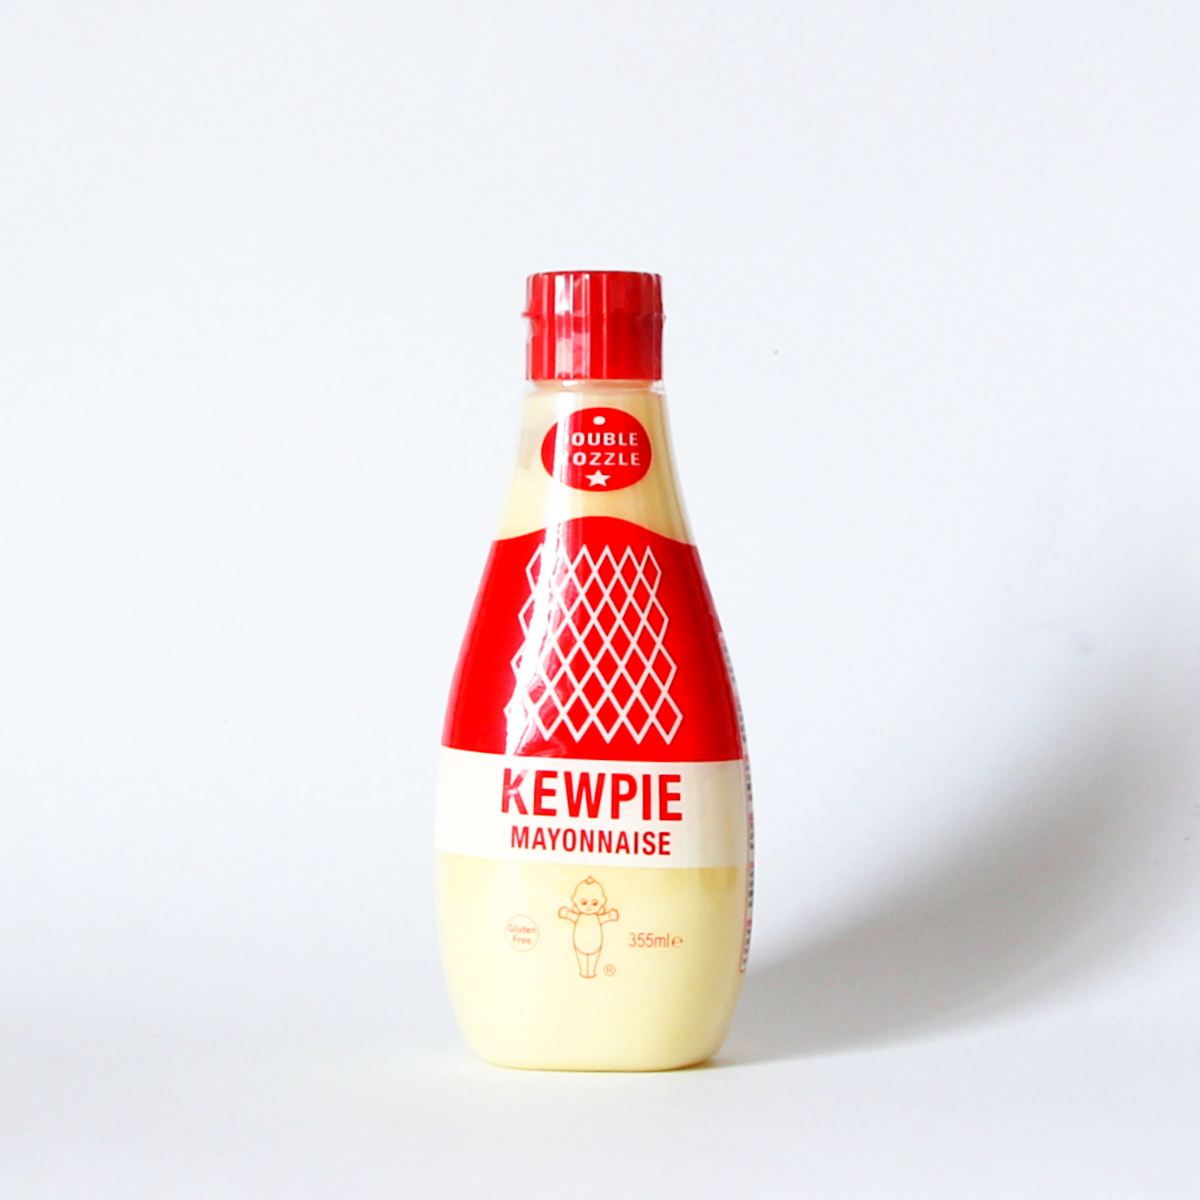 Mayonnaise 200g (japanische Mayonnaise), KEWPIE